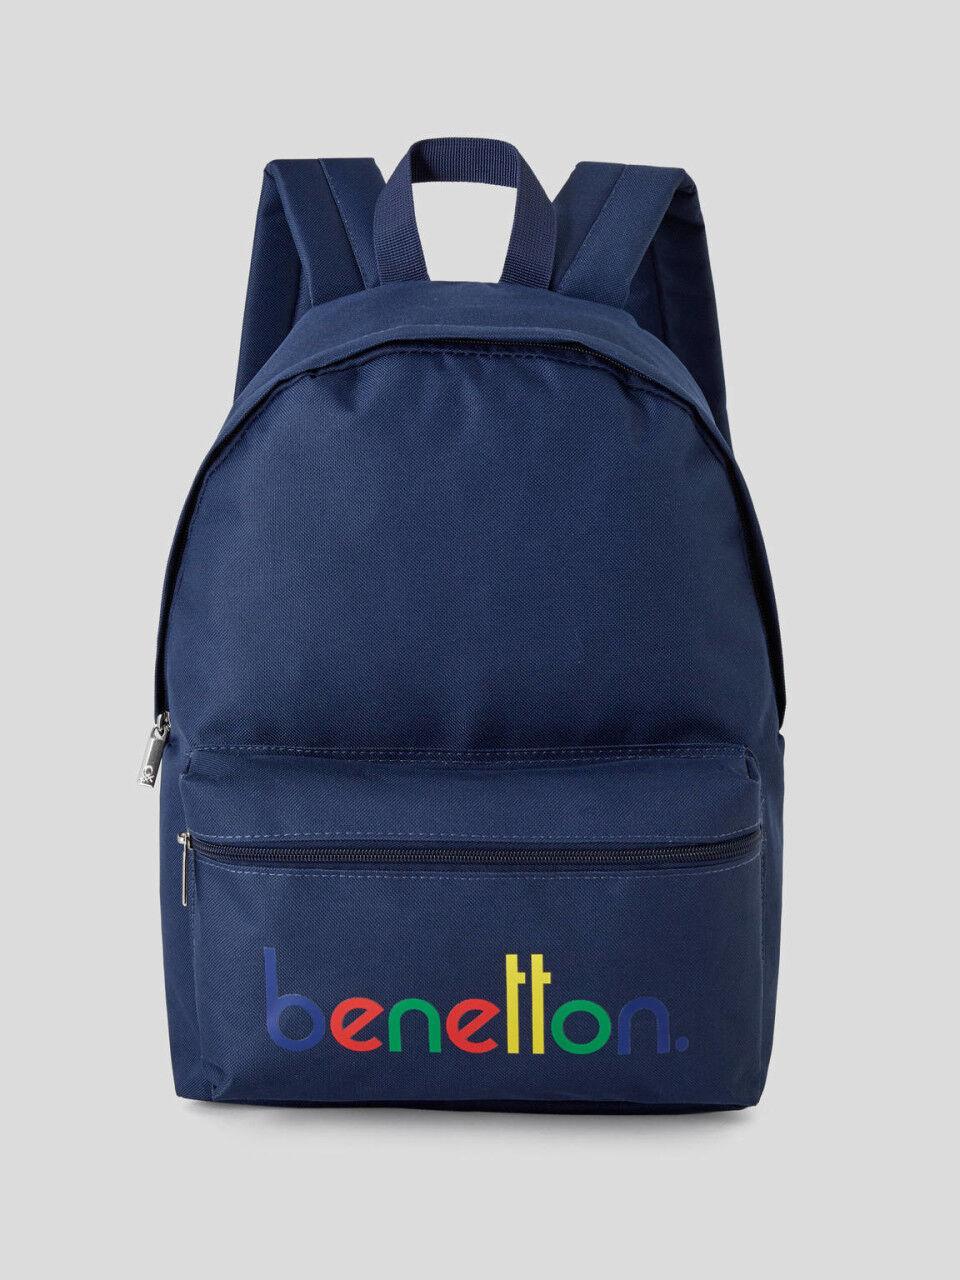 Benetton Backpack Rucksack Travel Holiday POLKA DOTS Turquoise School Bag OFFICI